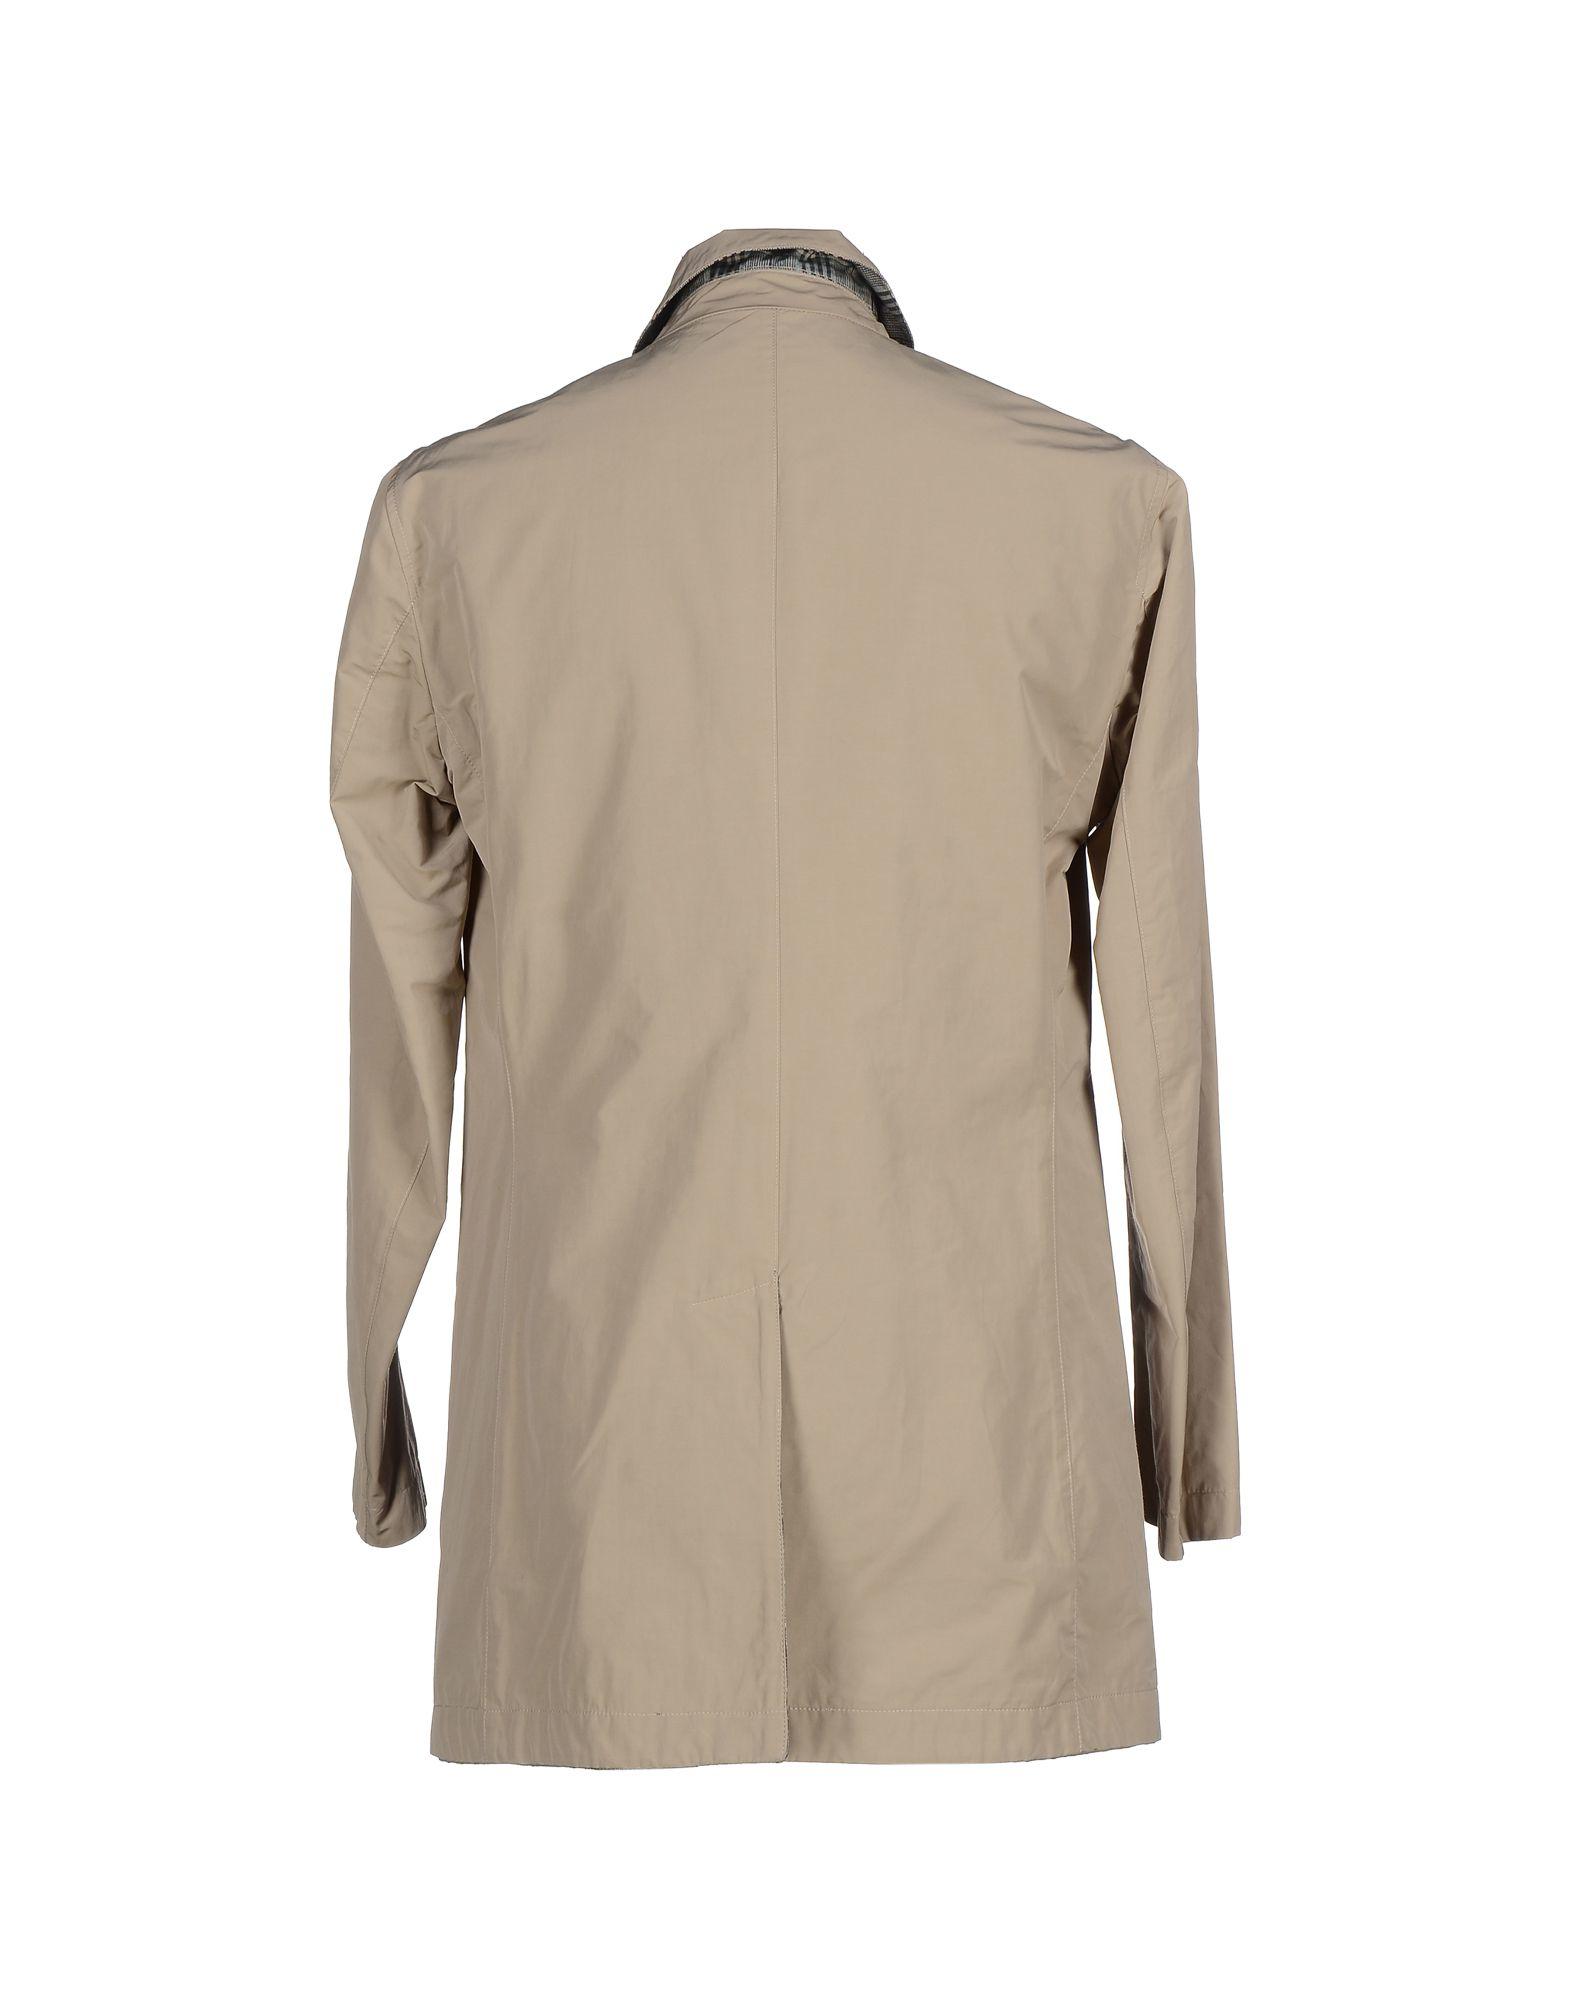 Aquarama Cotton Full-length Jacket in Sand (Natural) for Men